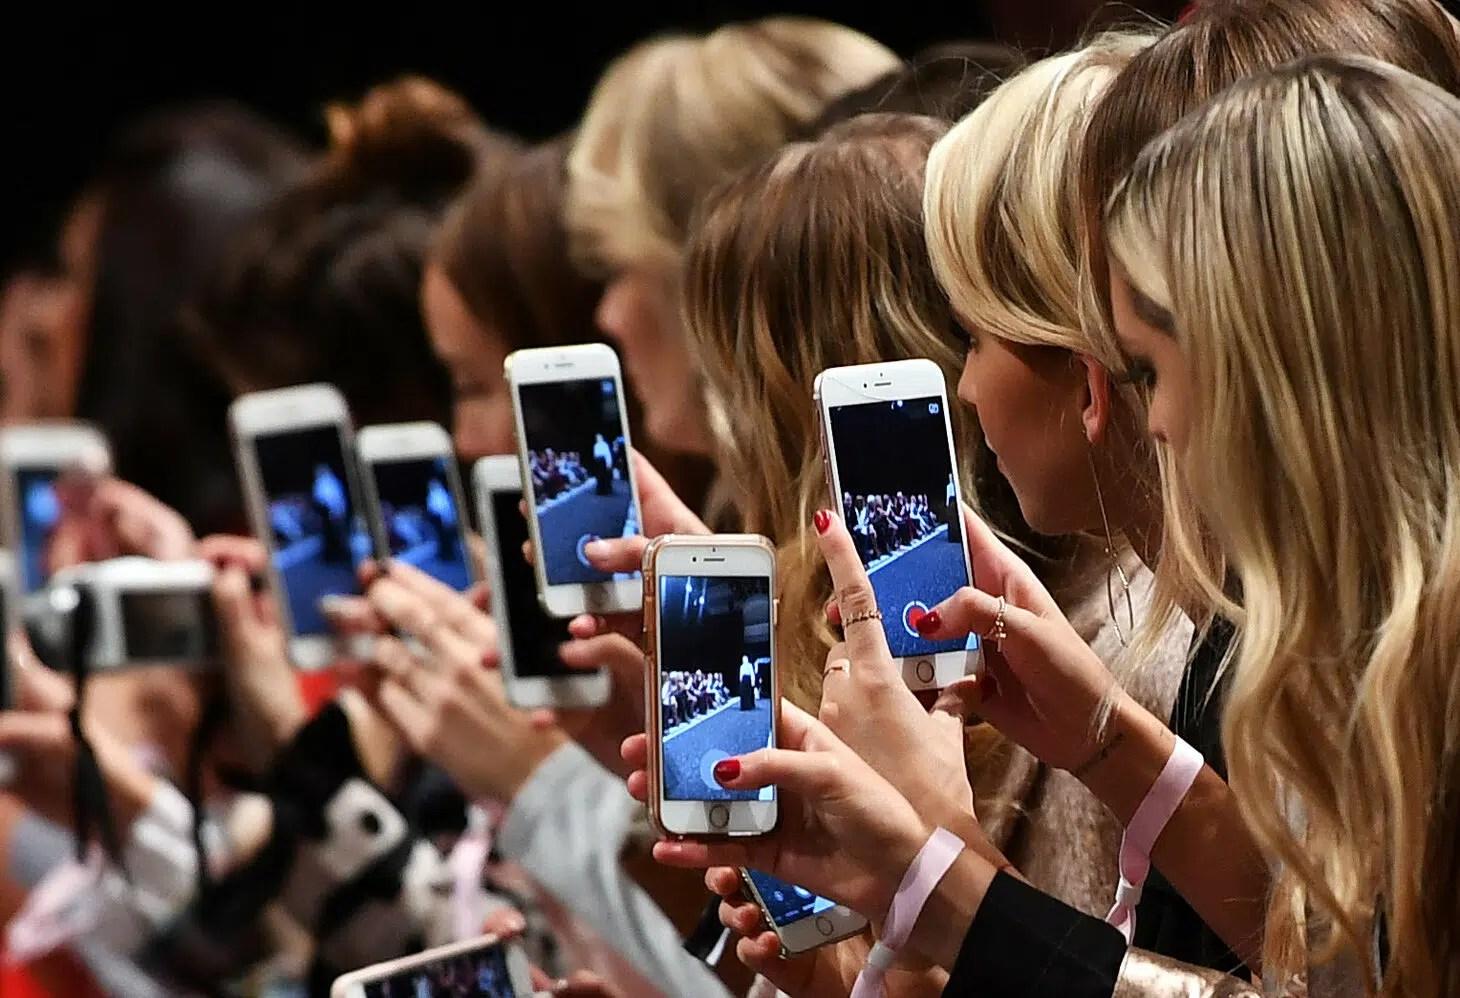 telefoni slika